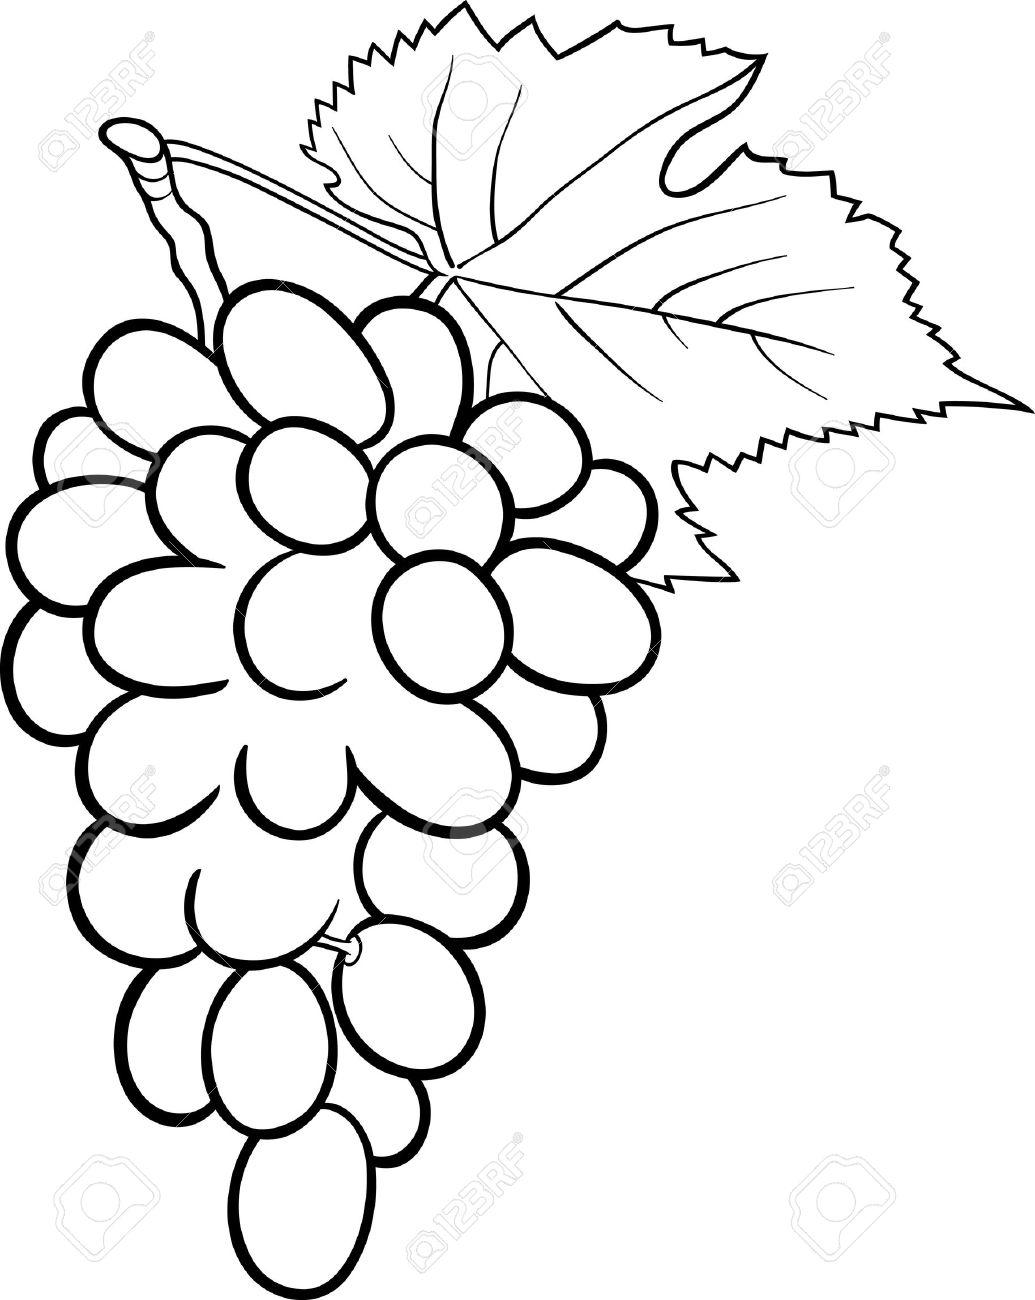 Black And White Grape Clipart.